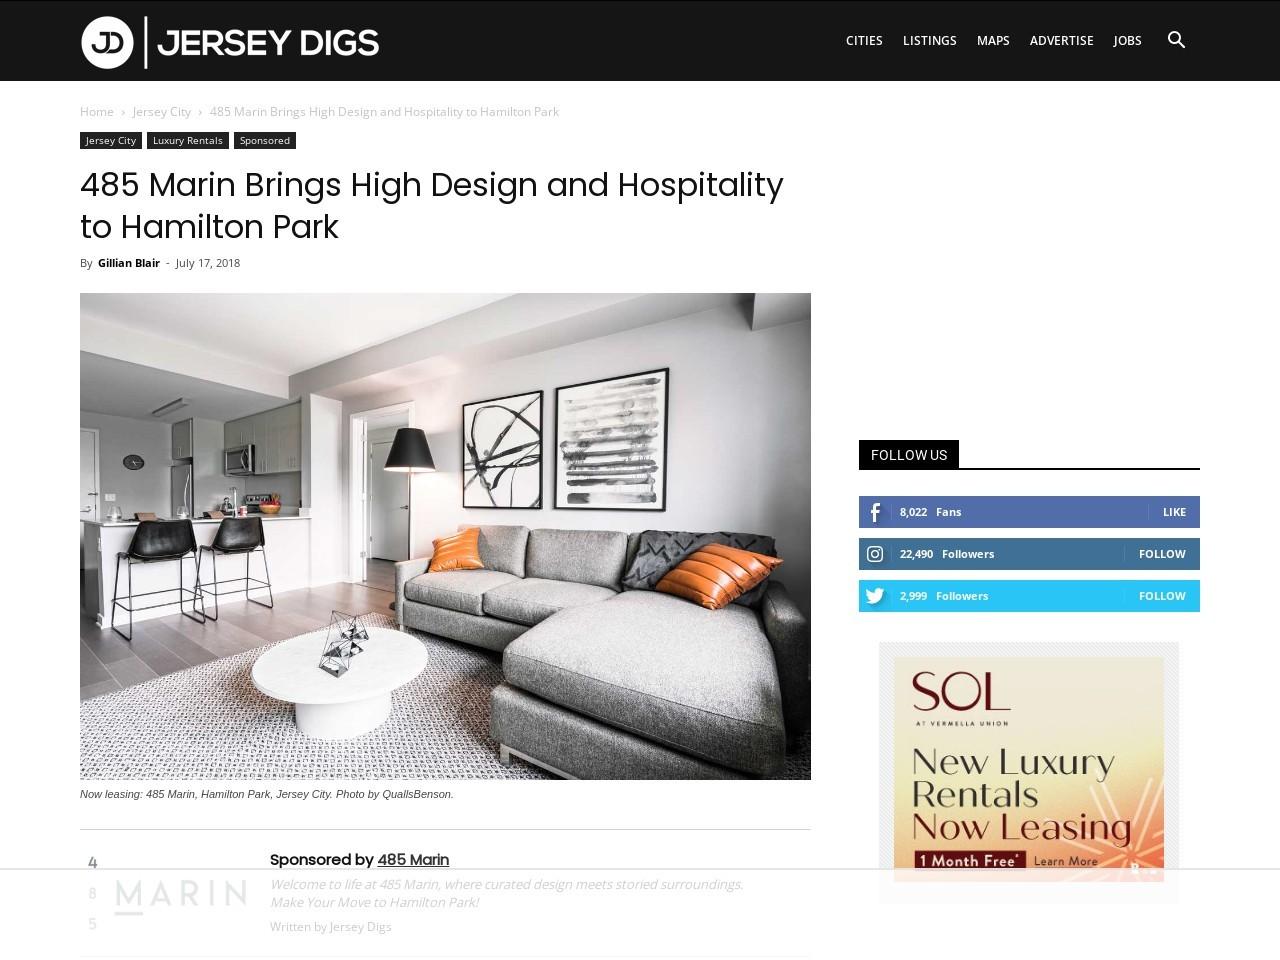 485 Marin Brings High Design and Hospitality to Hamilton Park